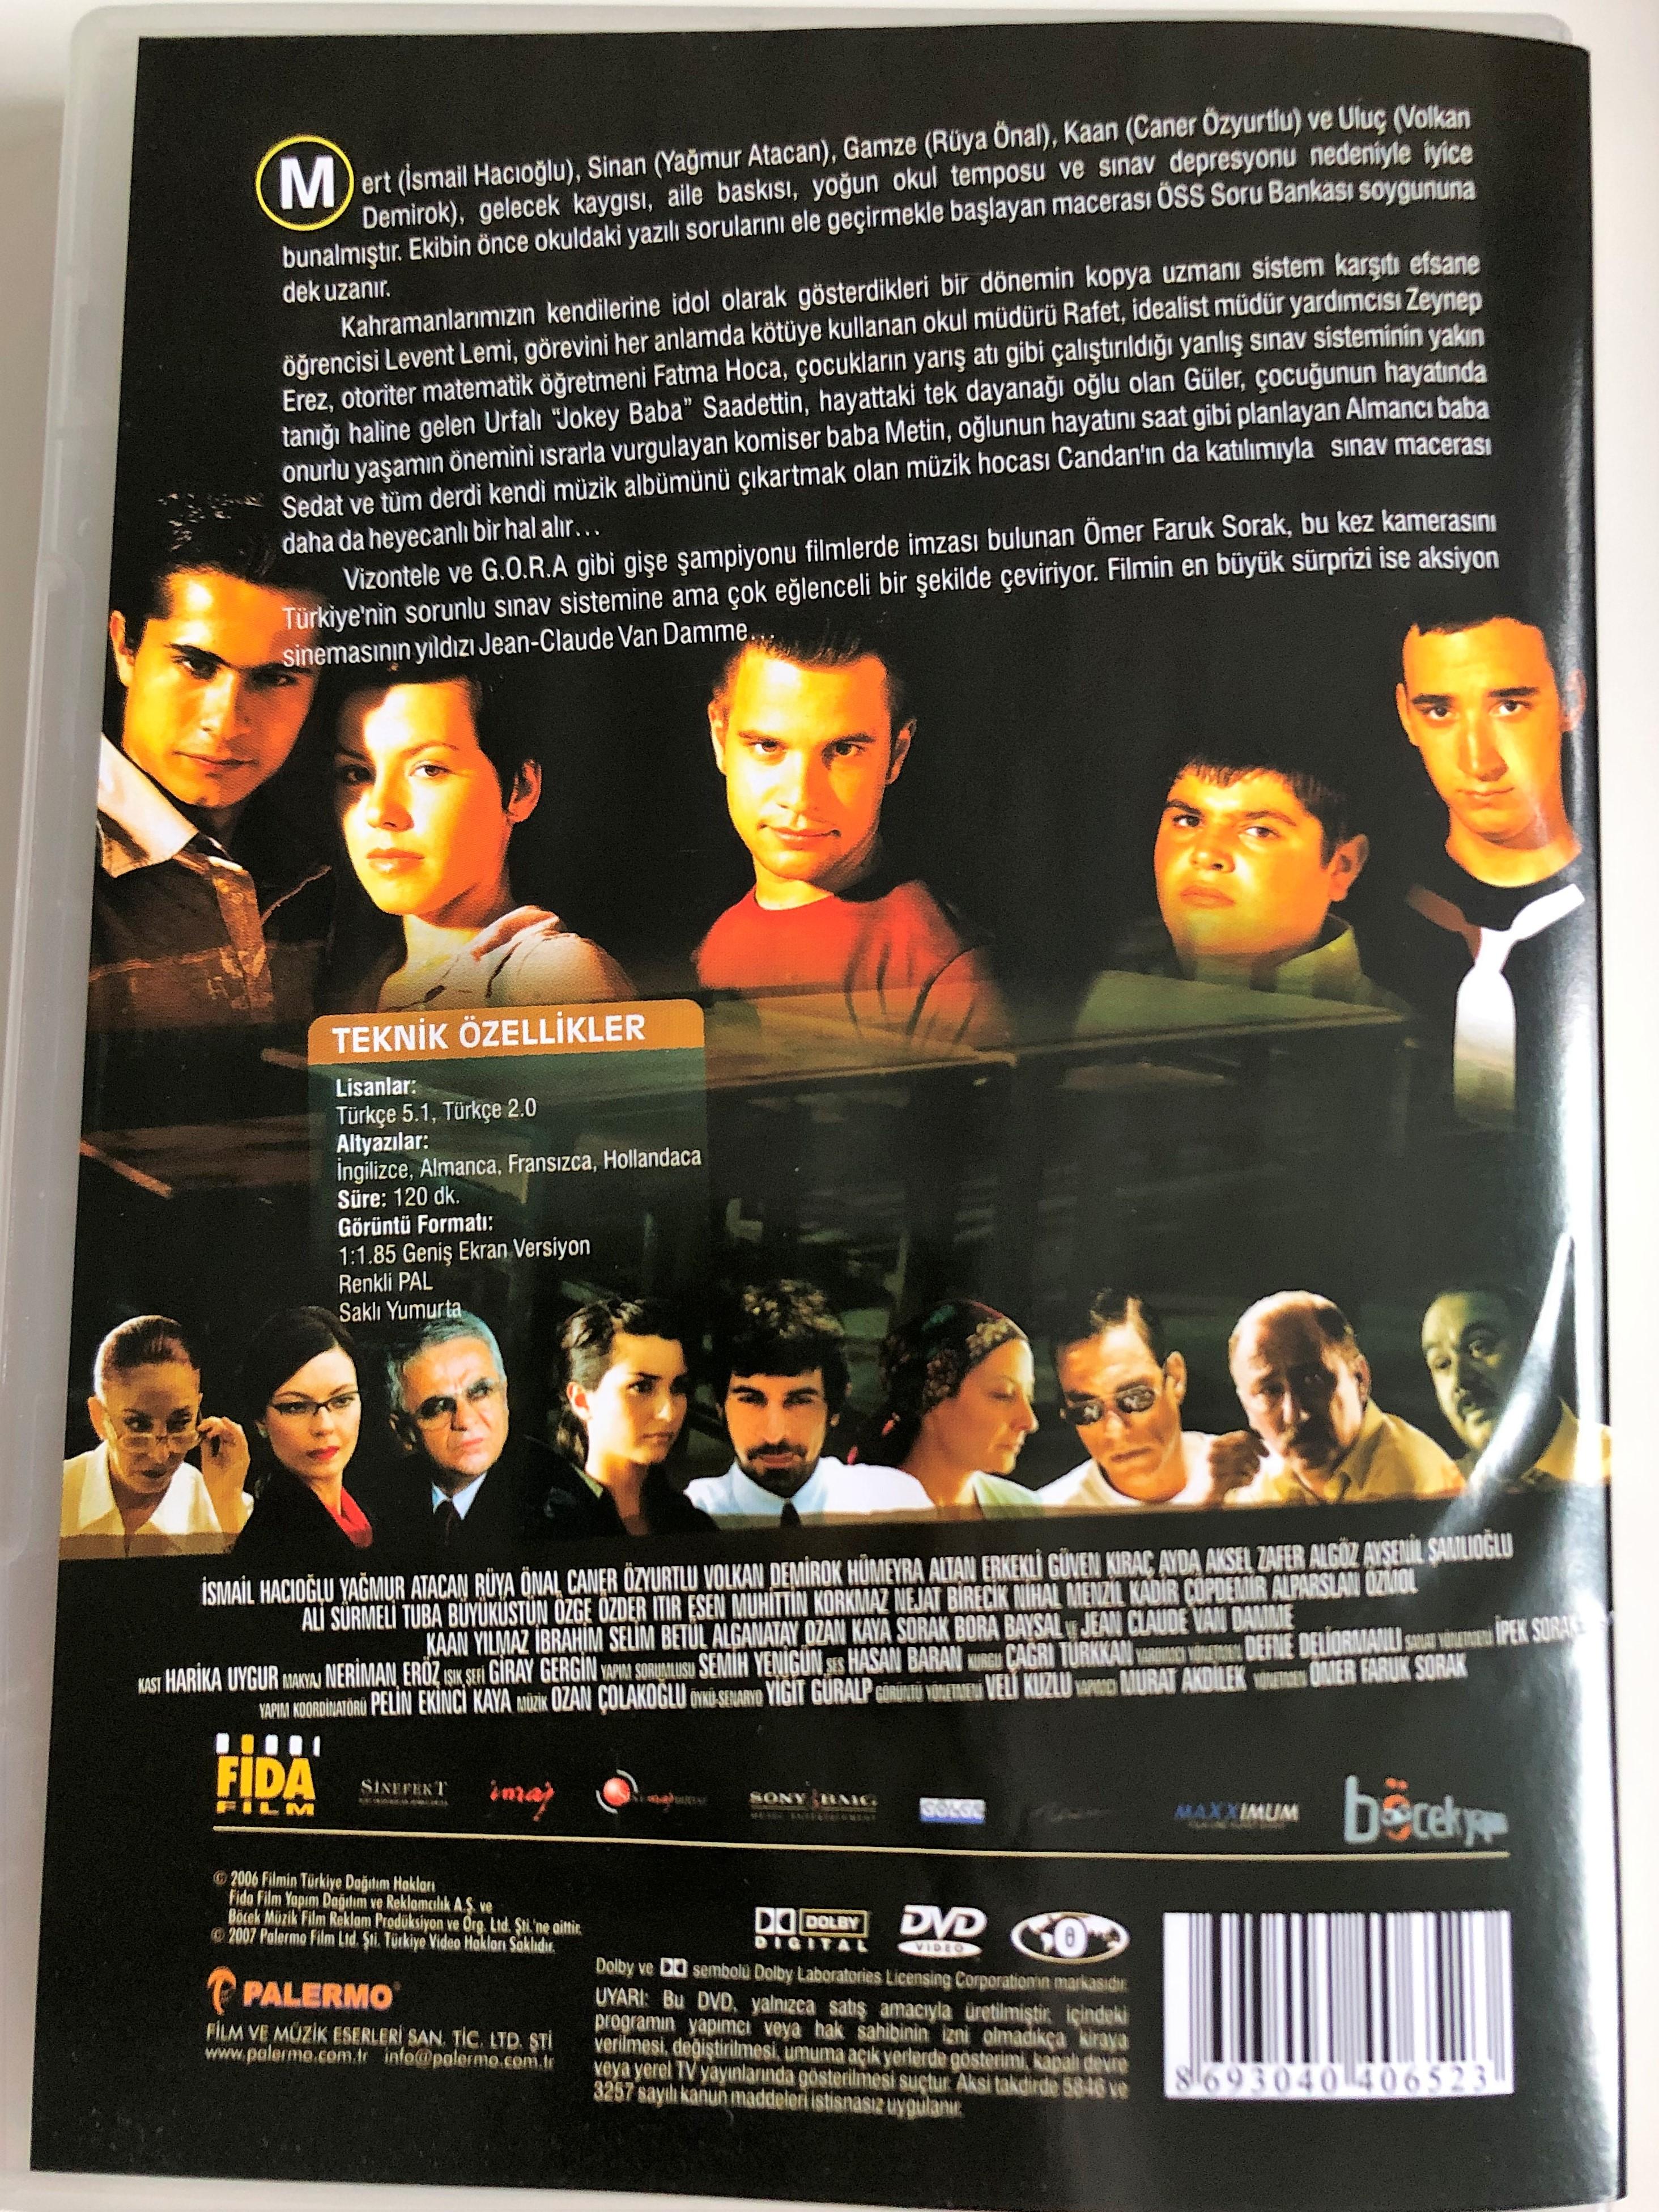 sinav-dvd-2006-heist-school-directed-by-mer-faruk-sorak-starring-jean-claude-van-damme-h-meyra-akbay-altan-erkekli-g-ven-k-ra-zafer-alg-z-2-.jpg